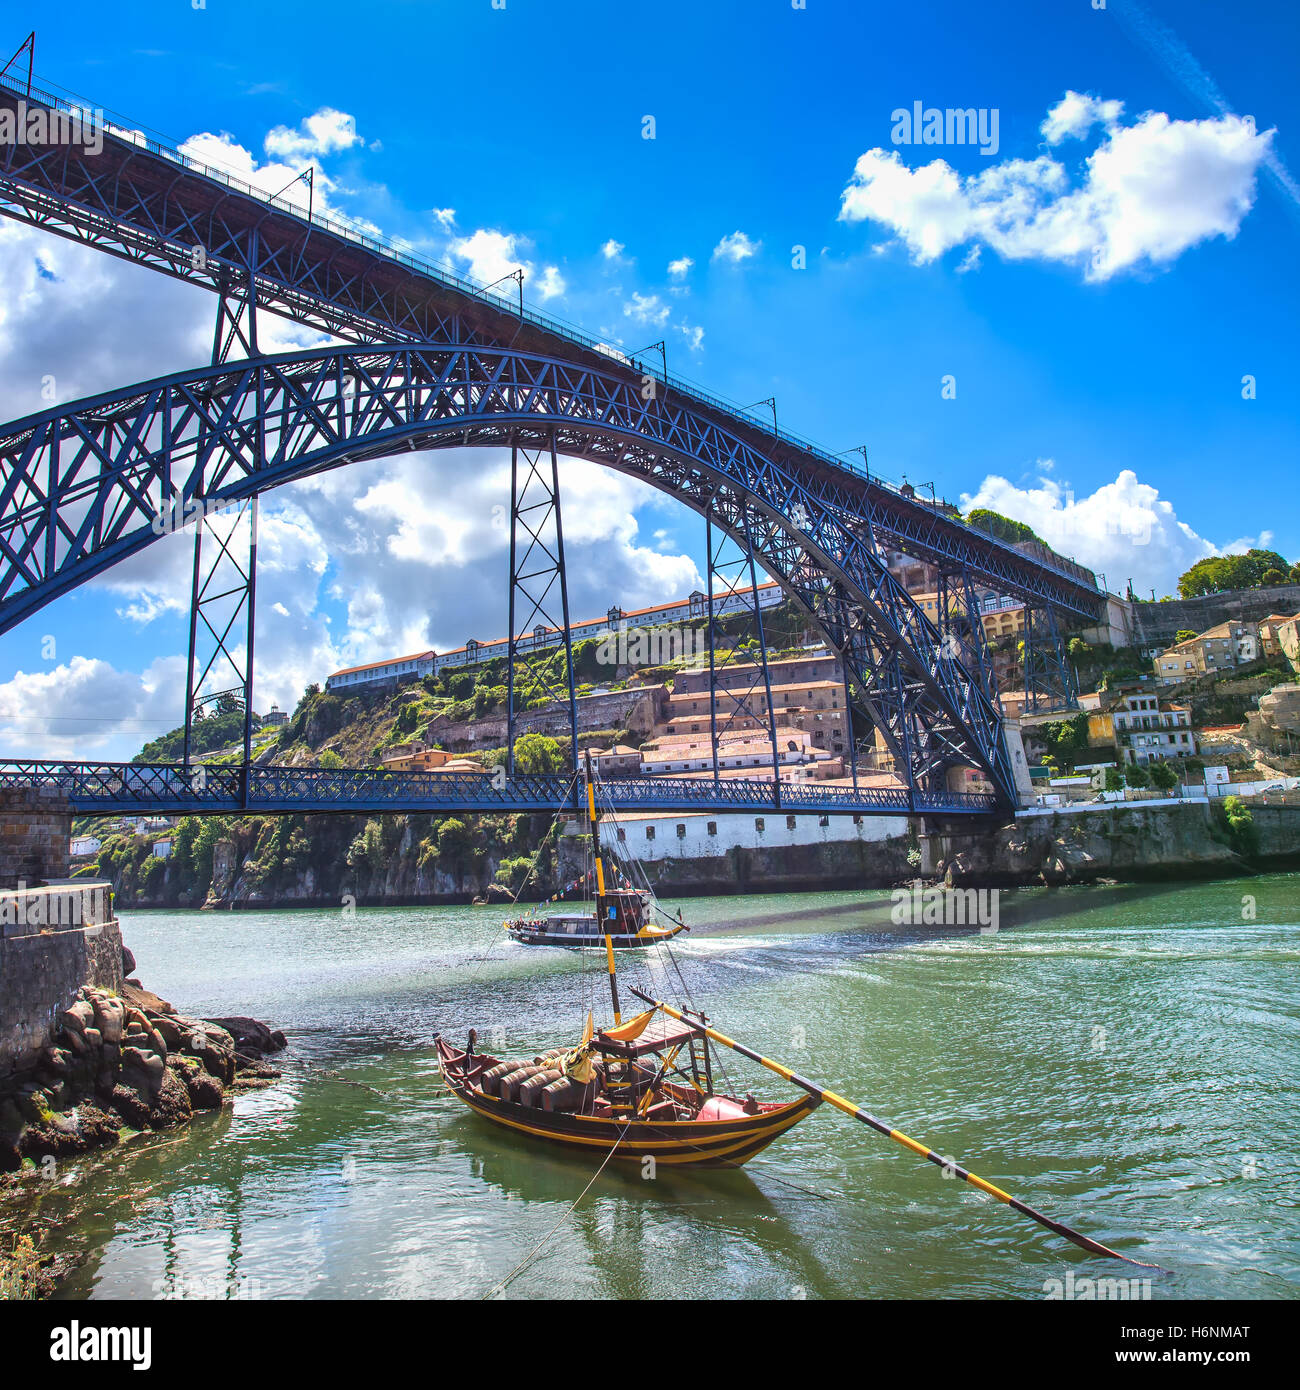 Oporto or Porto city skyline, Douro river, traditional boats and Dom Luis or Luiz iron bridge. Portugal, Europe. - Stock Image